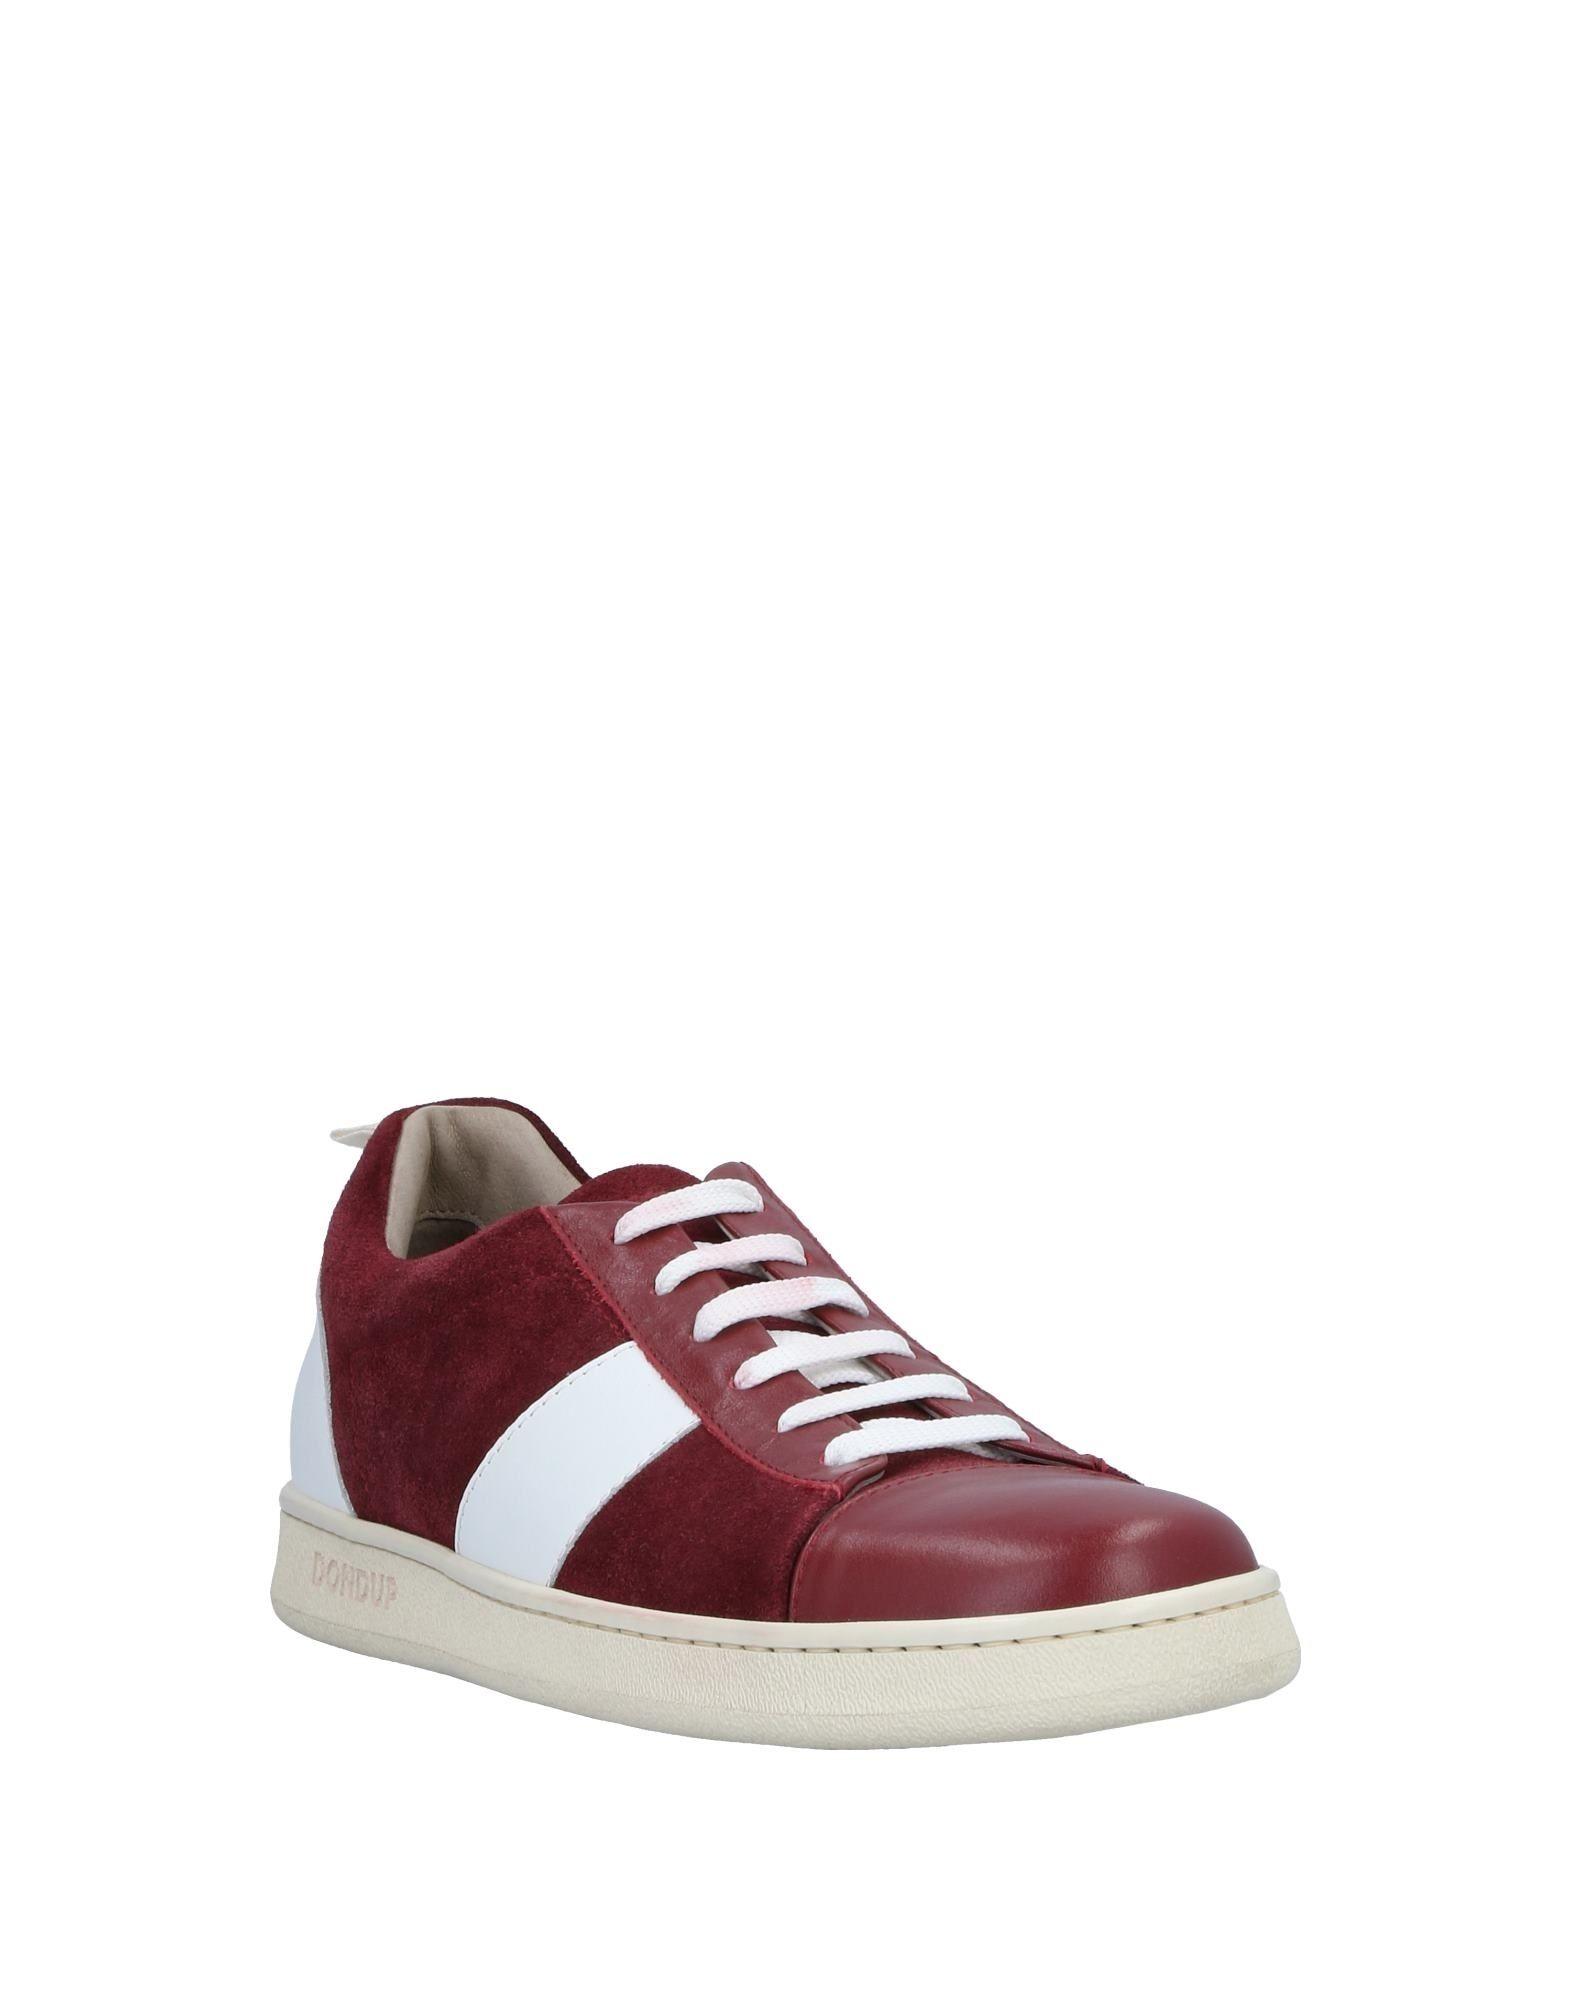 9c6a3388bcae ... Dondup Sneakers Qualität Herren 11526146VP Gute Qualität Sneakers  beliebte Schuhe 86bd12 ...